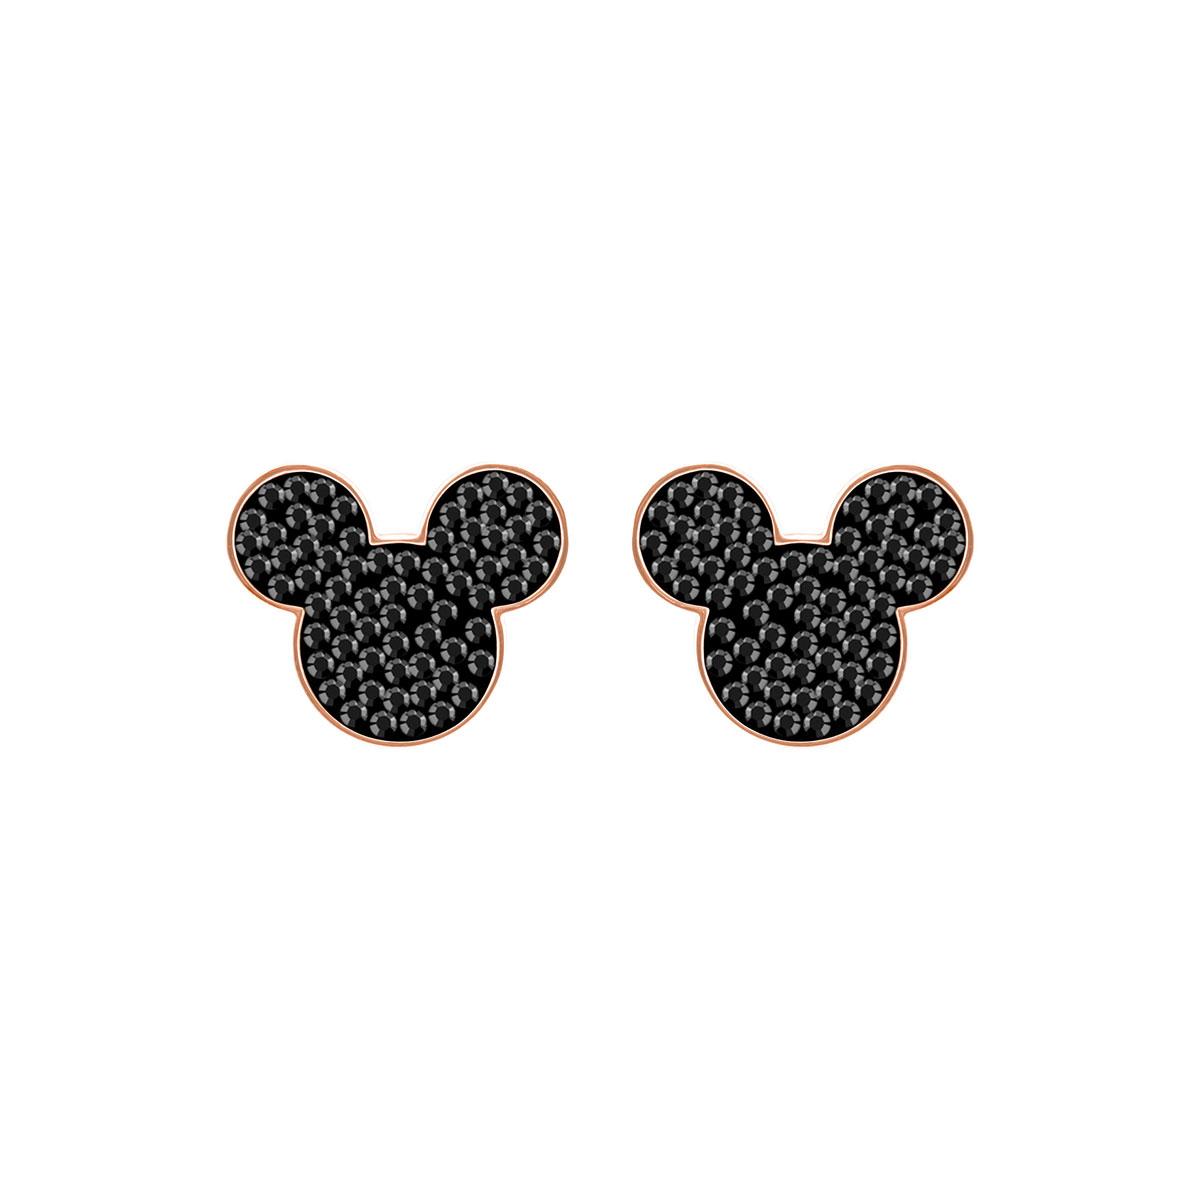 Swarovski Mickey and Minnie Pierced Earrings, Black, Rose Gold